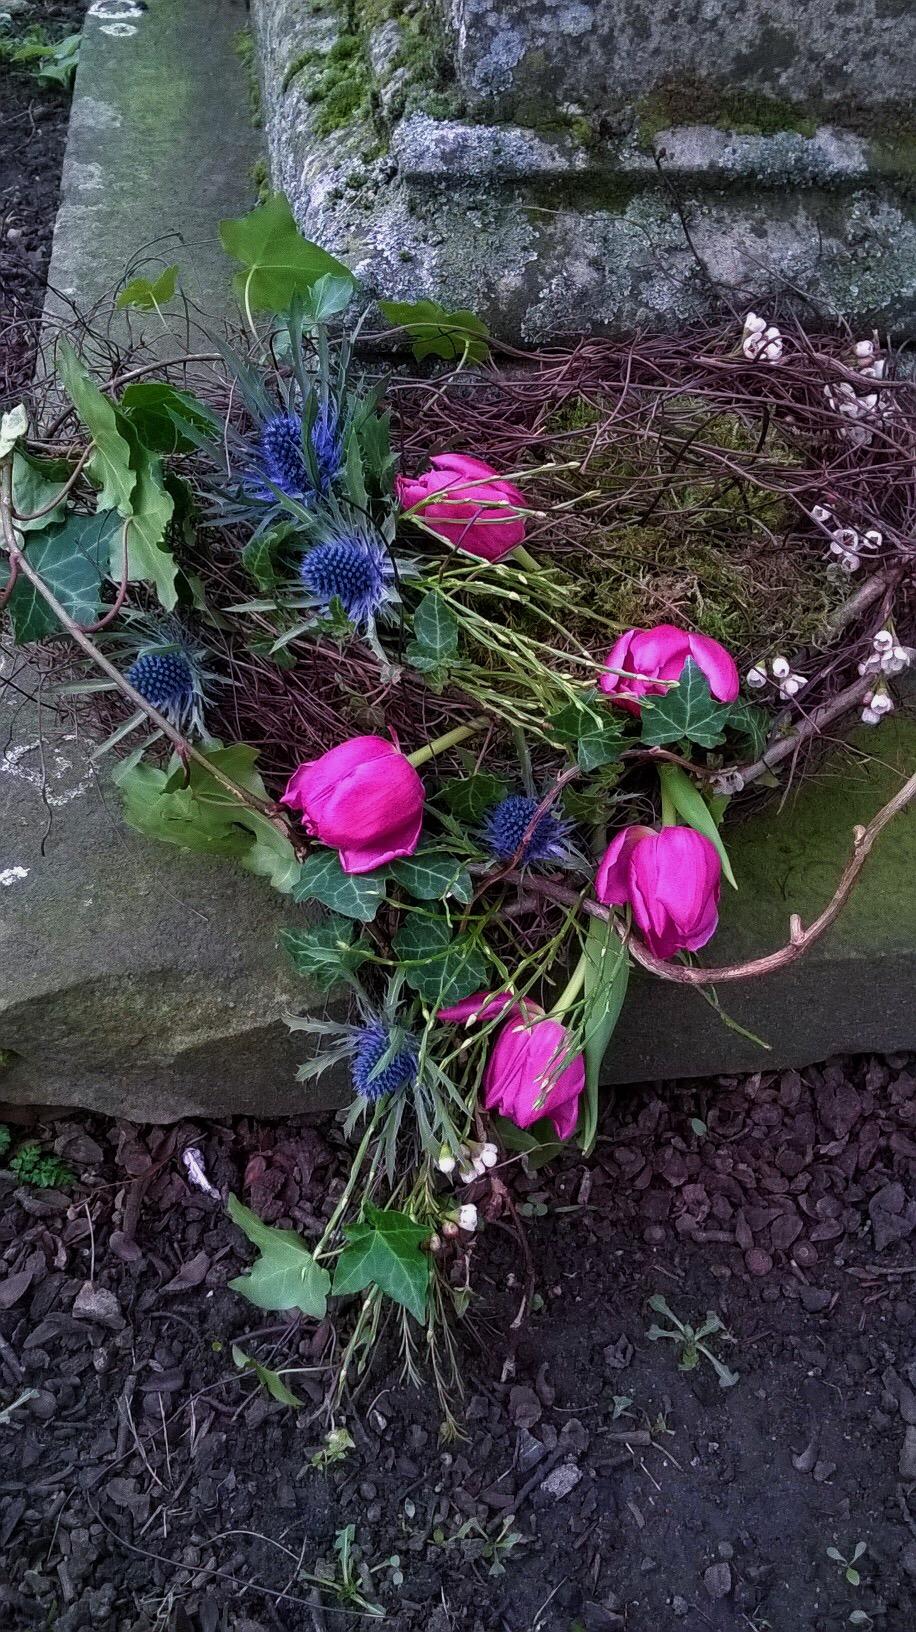 Vine Heart Clare Cowling Feb 2016.jpg